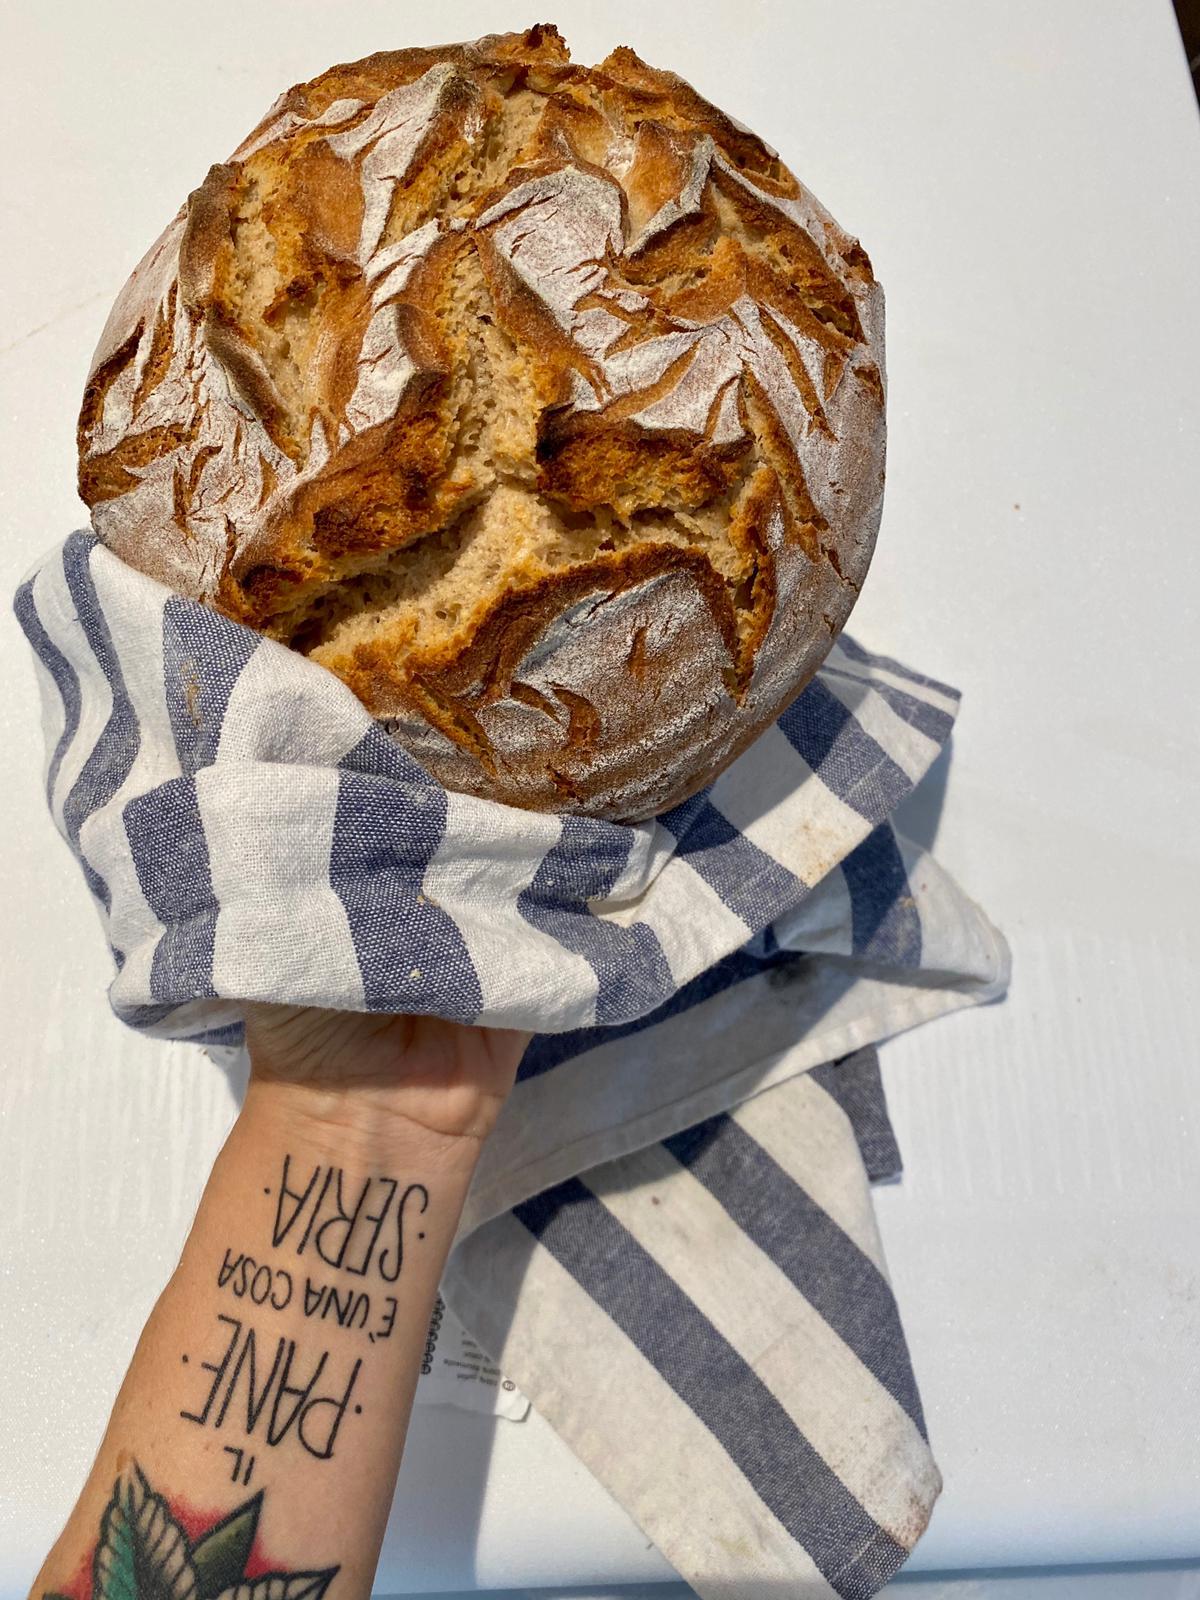 pane forno demetra di sabrina bianchi e roberta pezzella